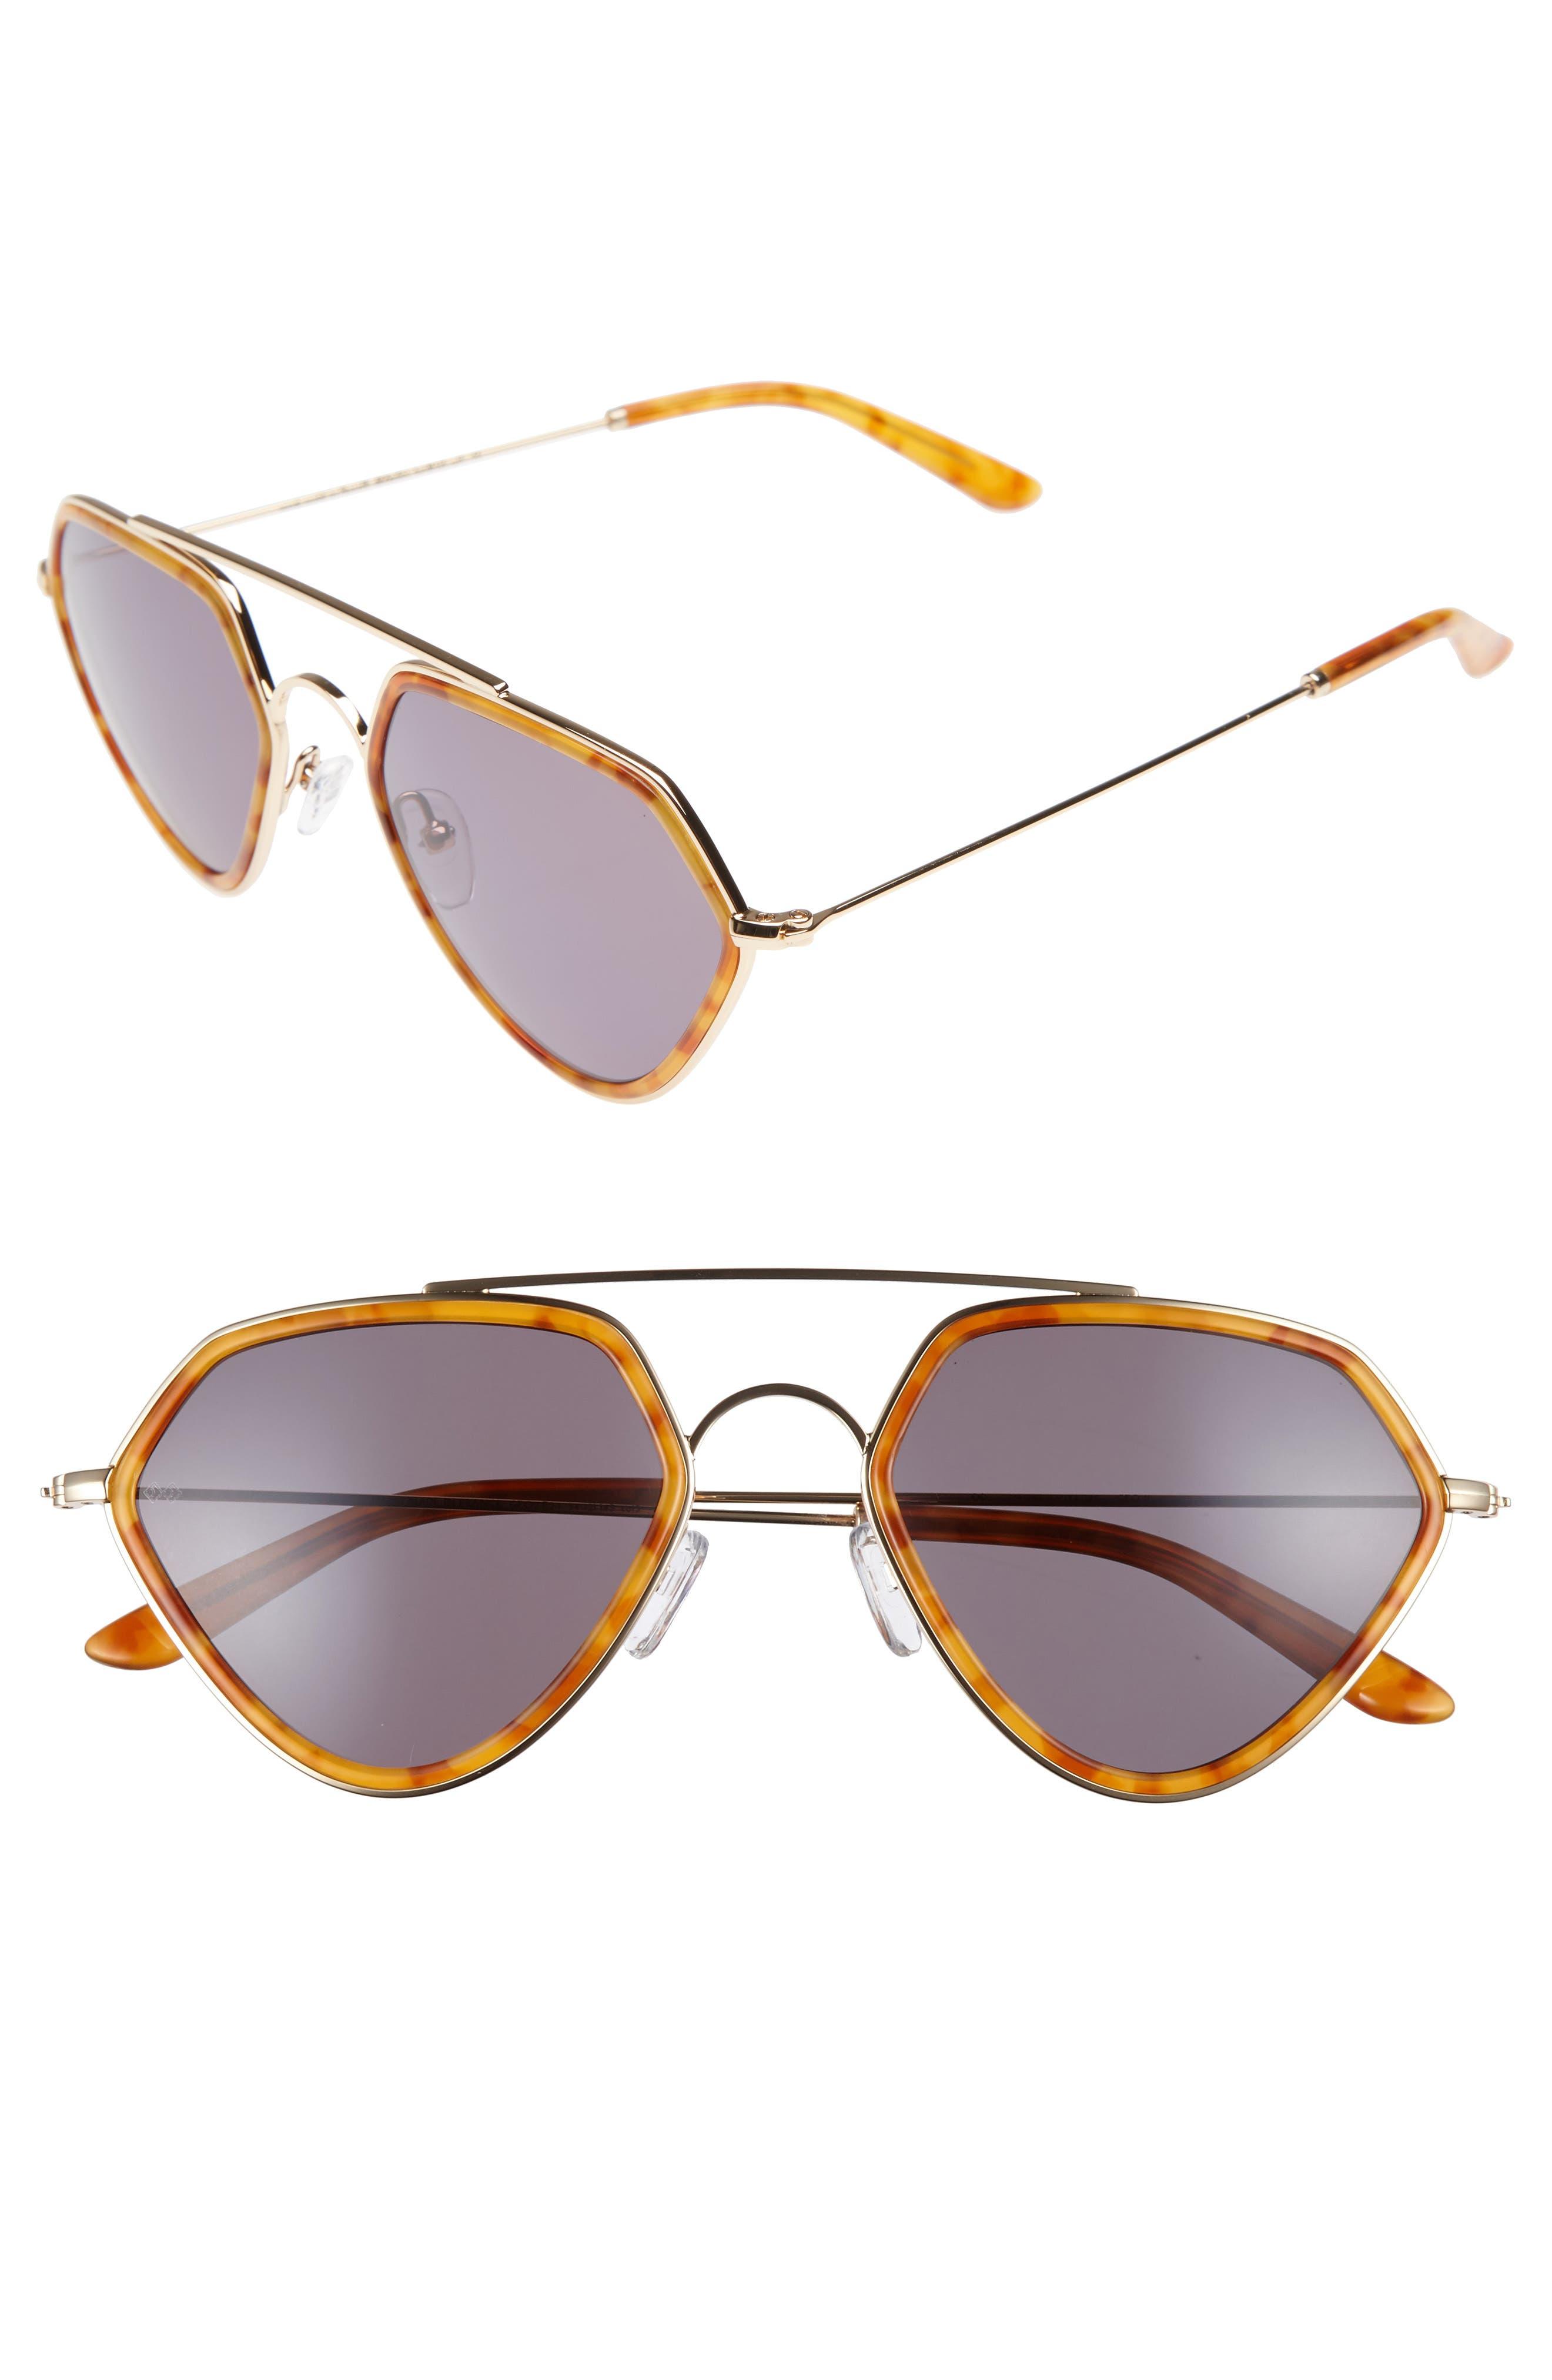 Geo 2 53mm Retro Sunglasses,                             Main thumbnail 1, color,                             206